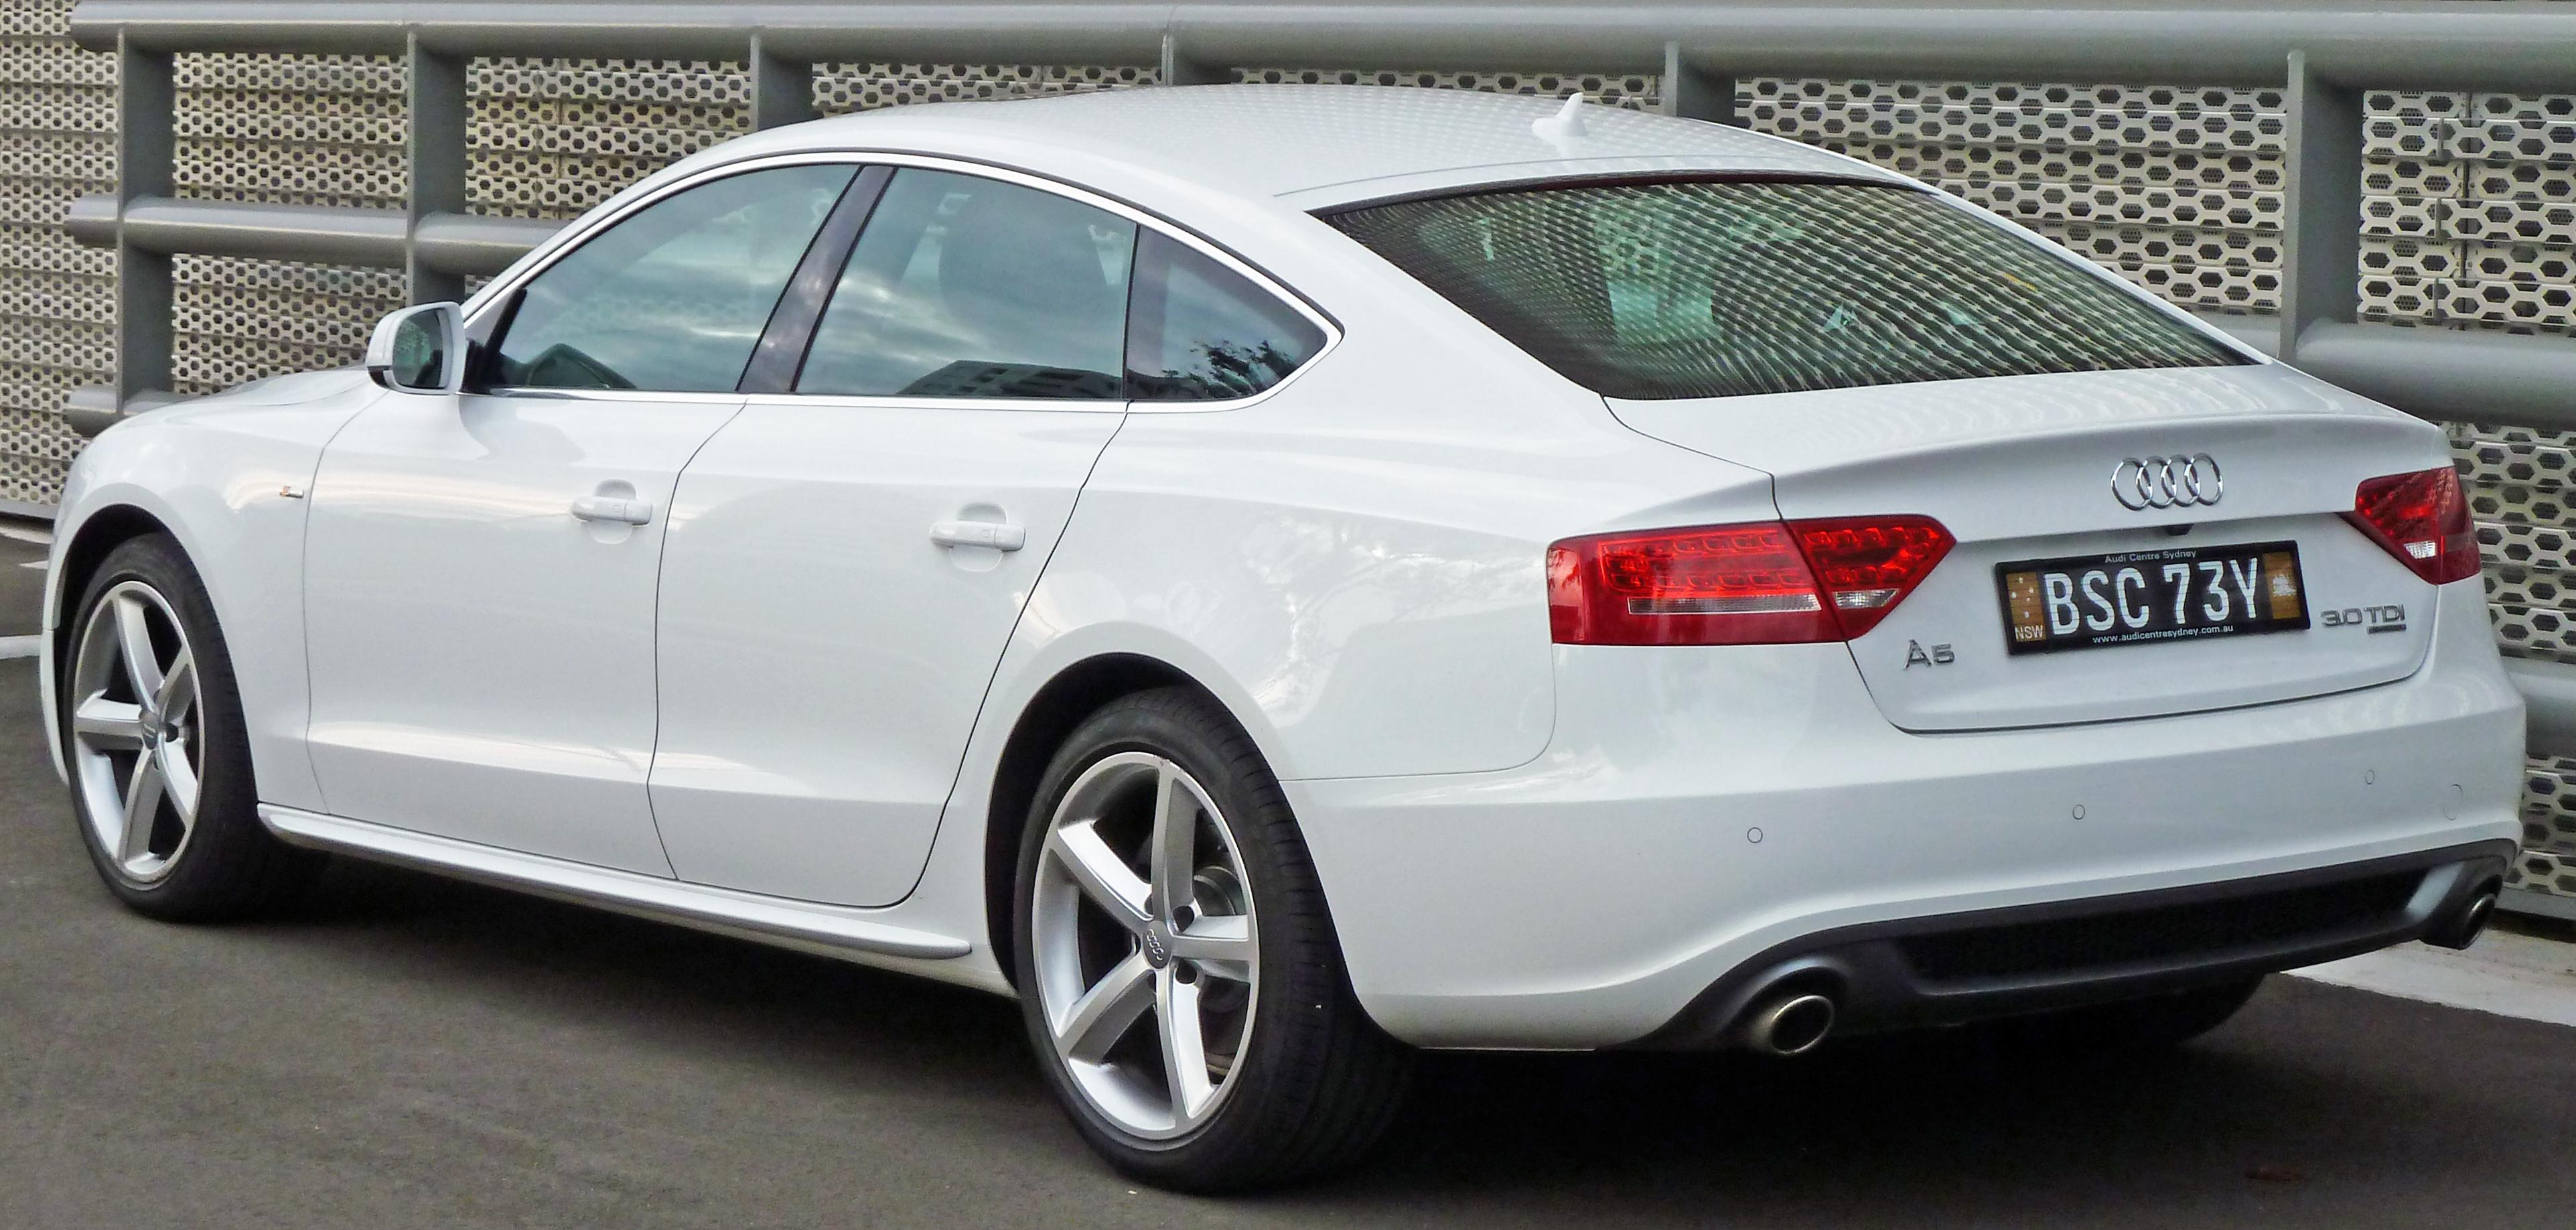 Audi a5 tdi 2010 15